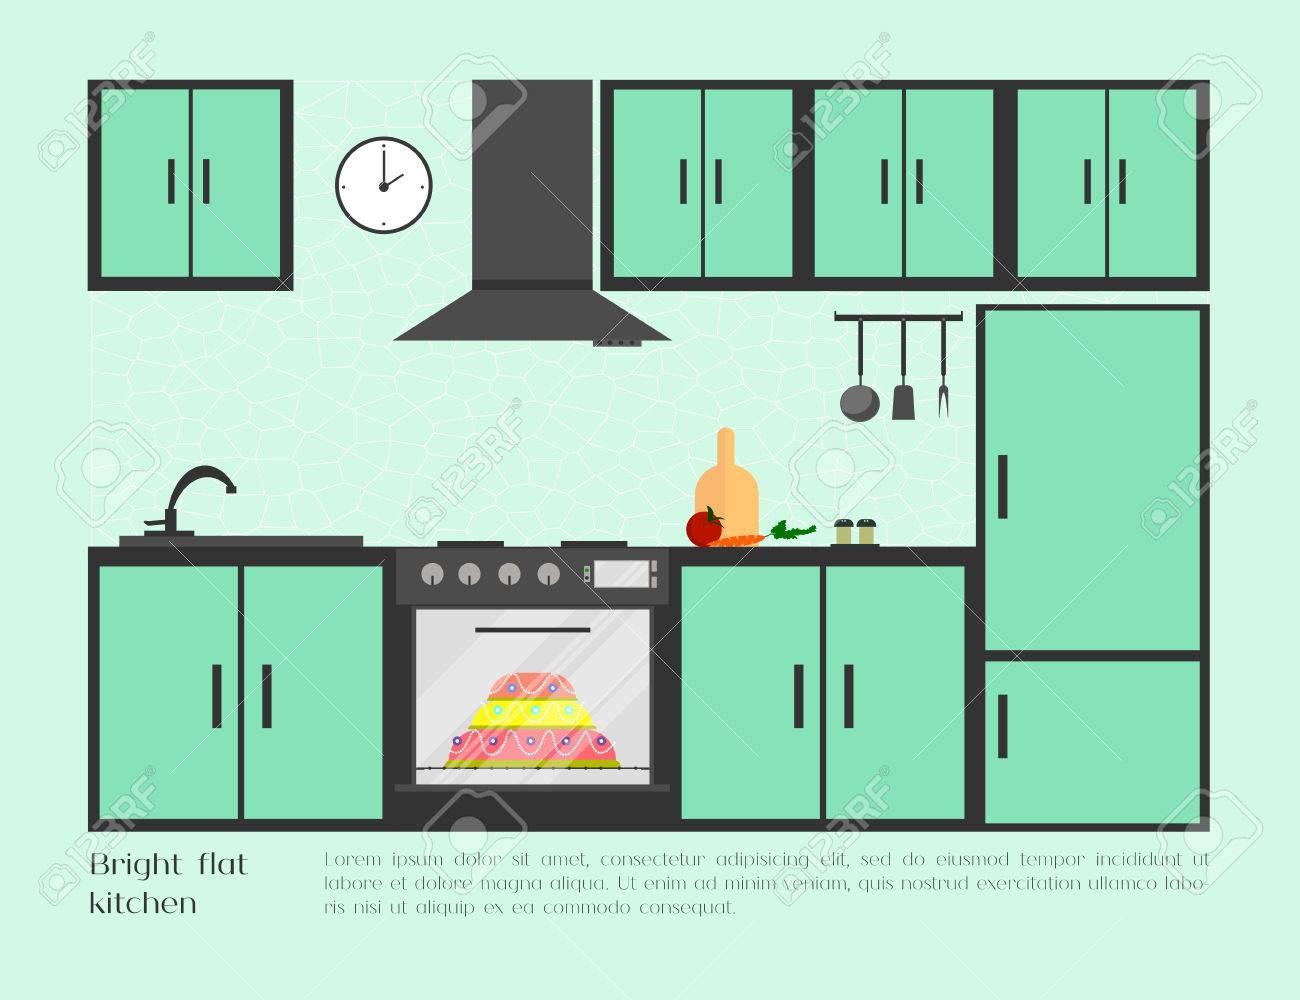 Home, Cafe Or Restaurant Bright Flat Kitchen With Kitchen Sink ...